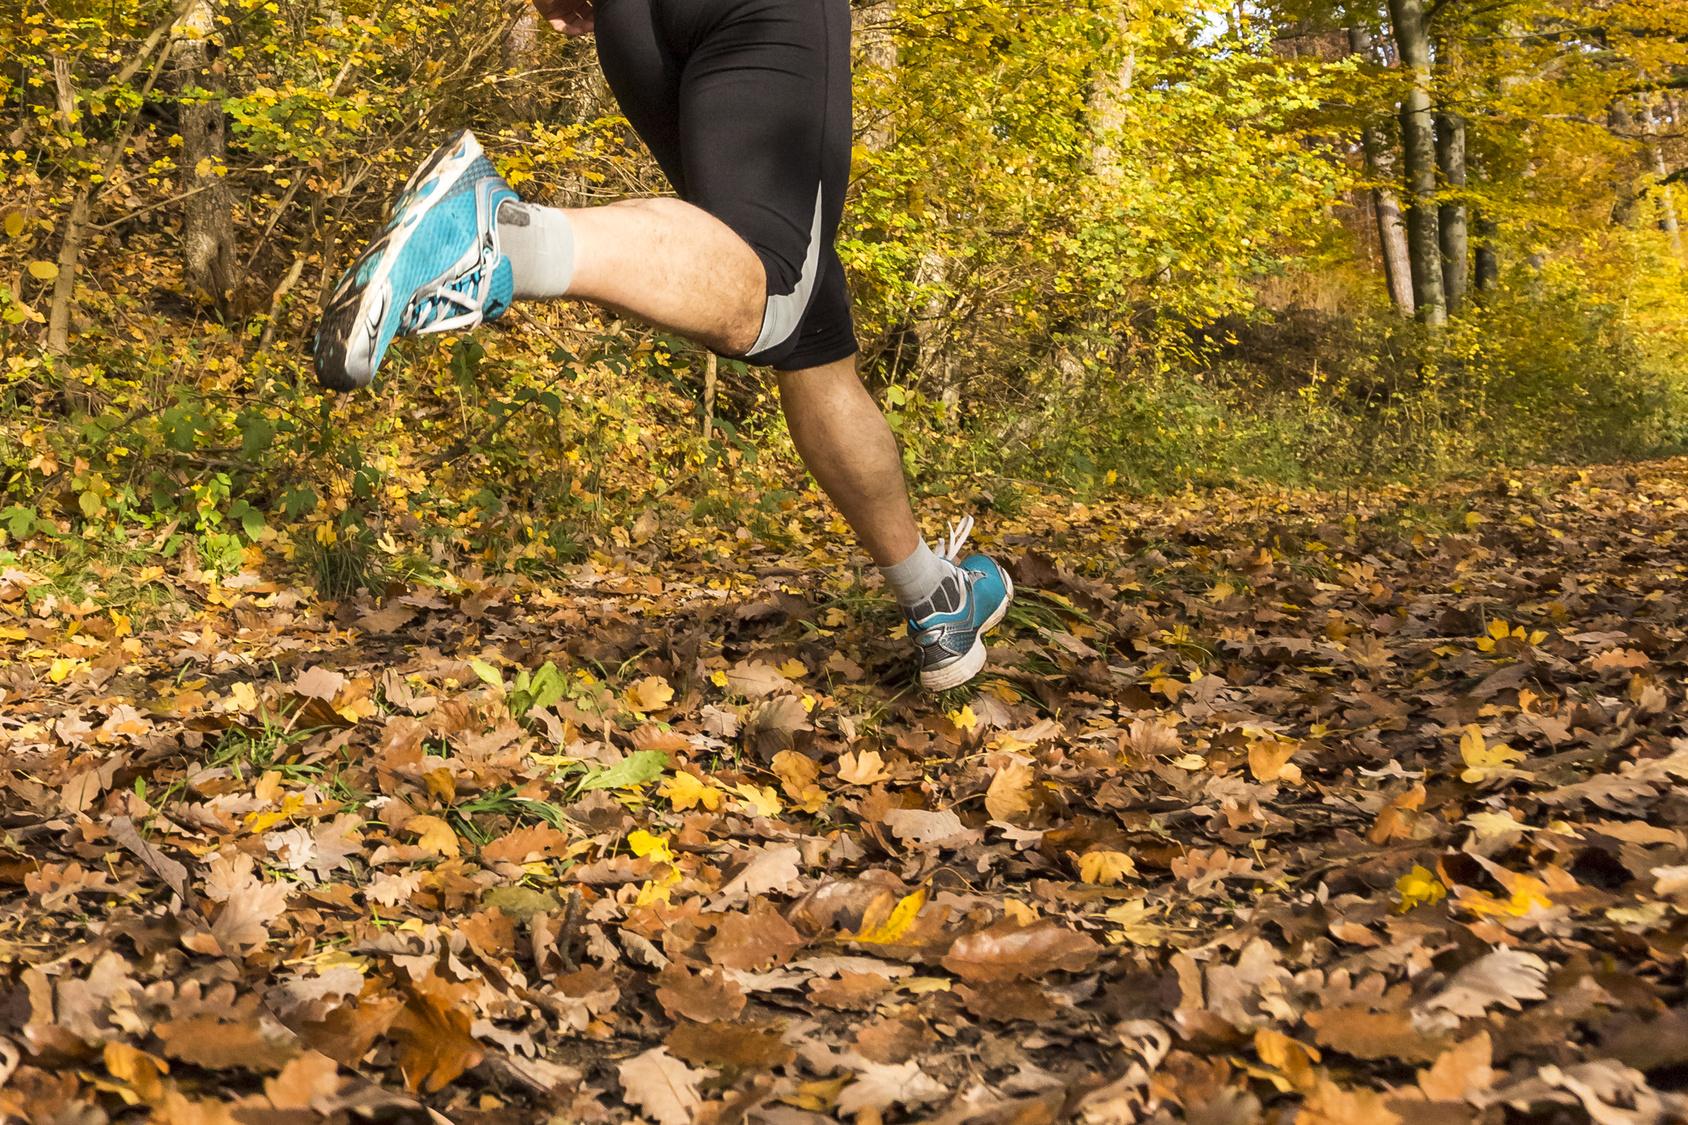 lechuga interior enfermo  Fisioterapia y Trailrunning - Alcorcón